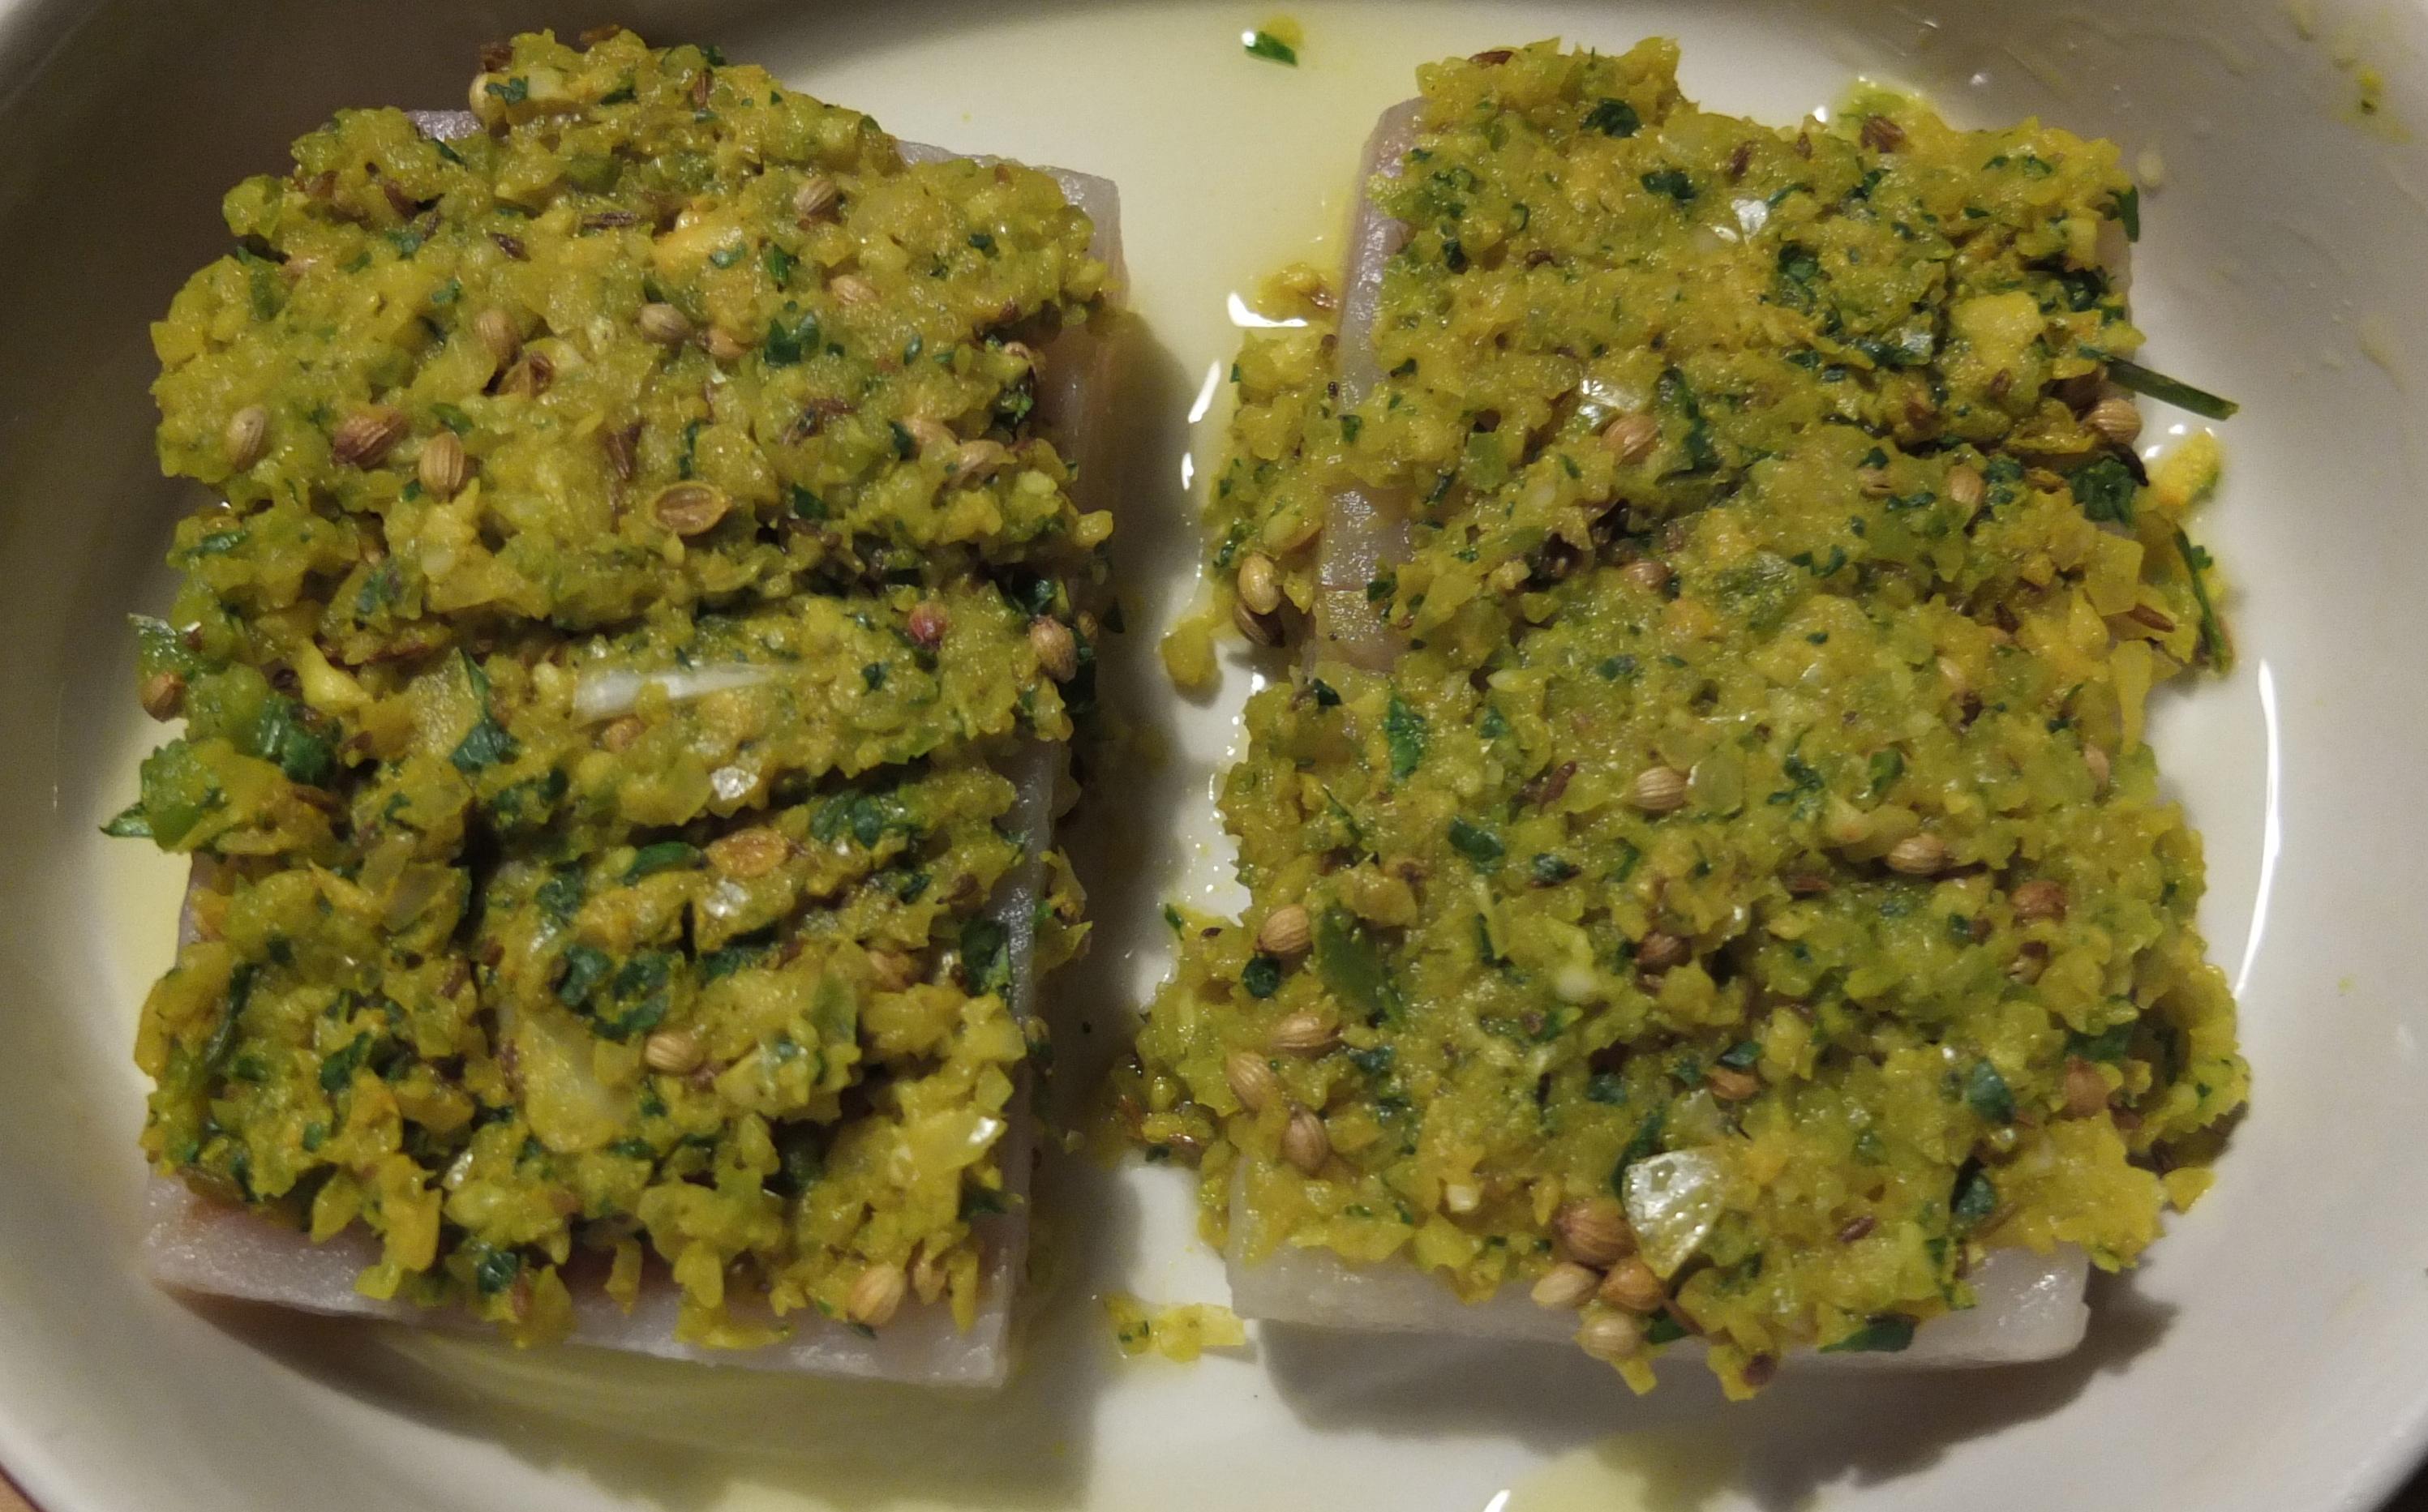 Baked fish olive oil garlic parsley for Baked fish seasoning